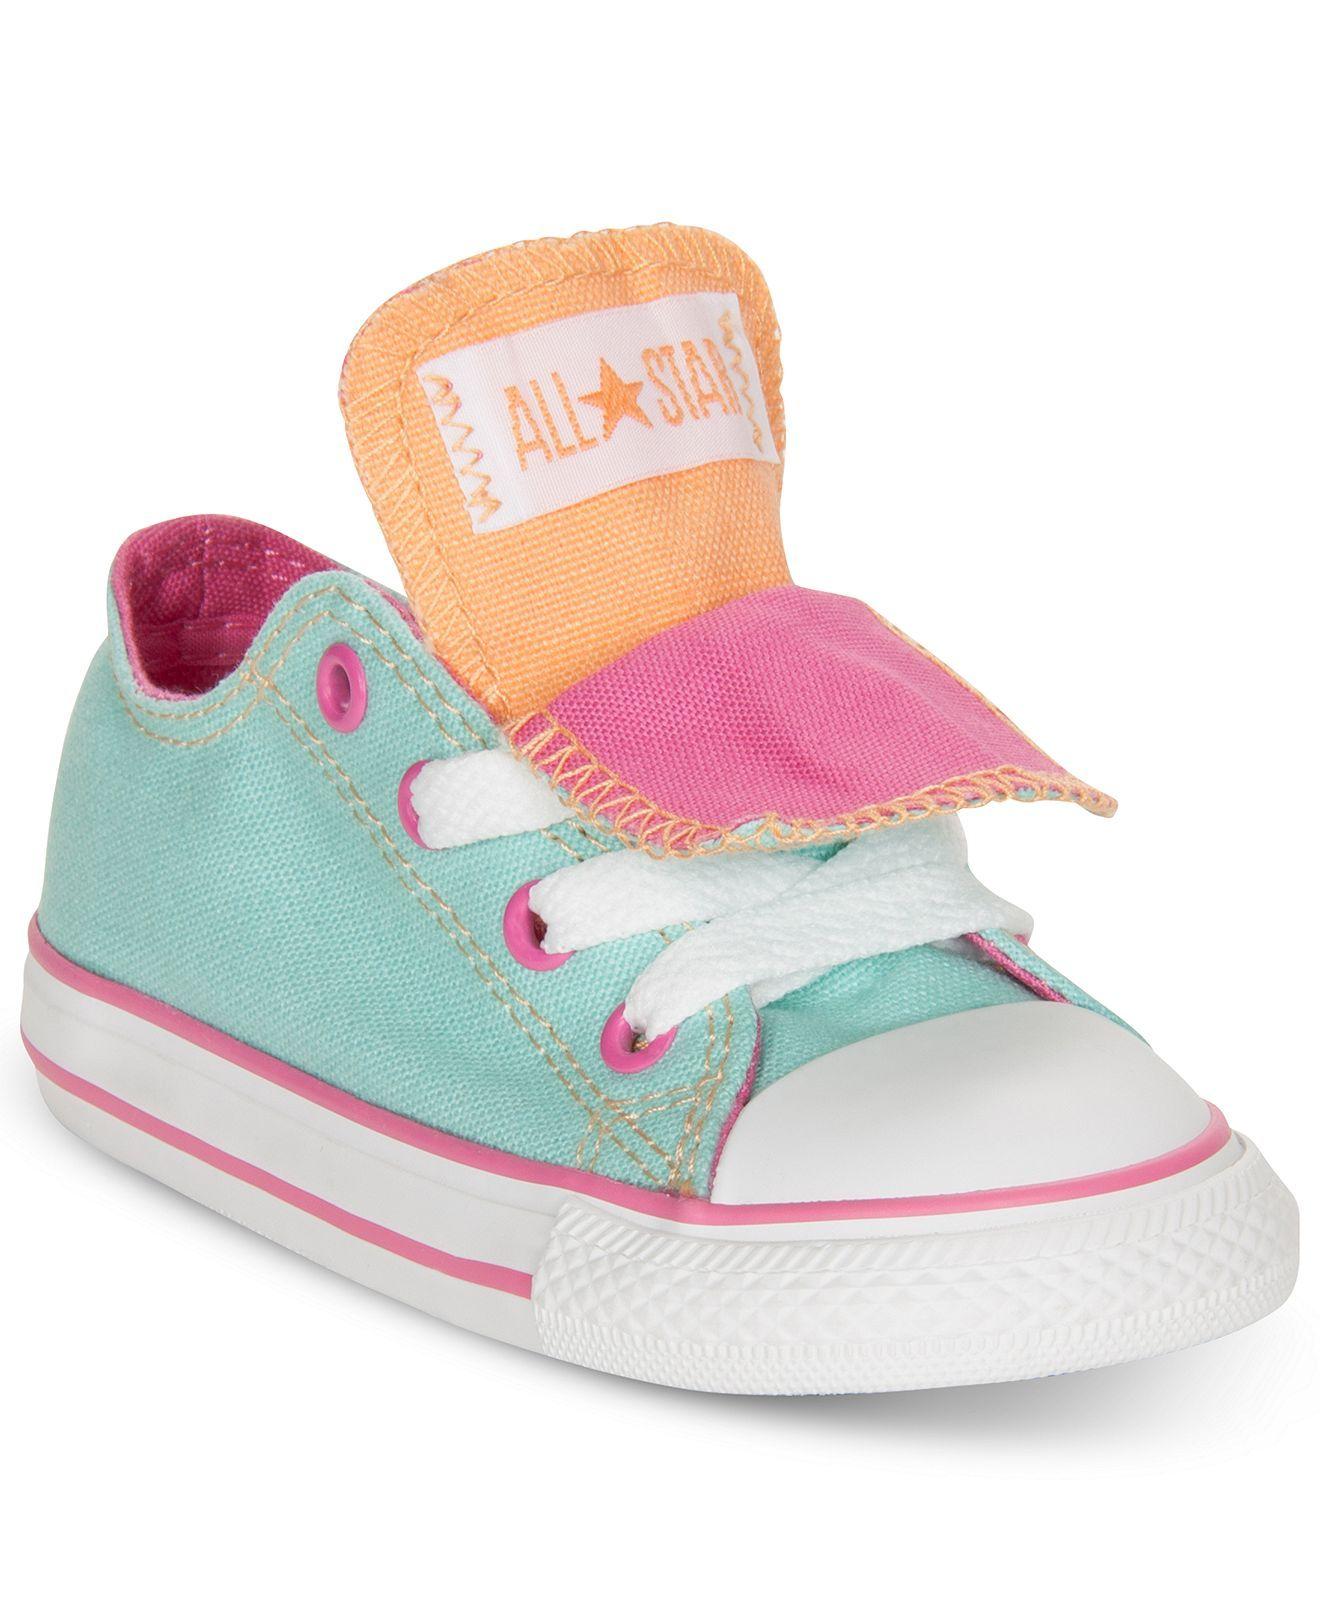 Converse Kids Shoes, Girls Chuck Double Tongue Casual